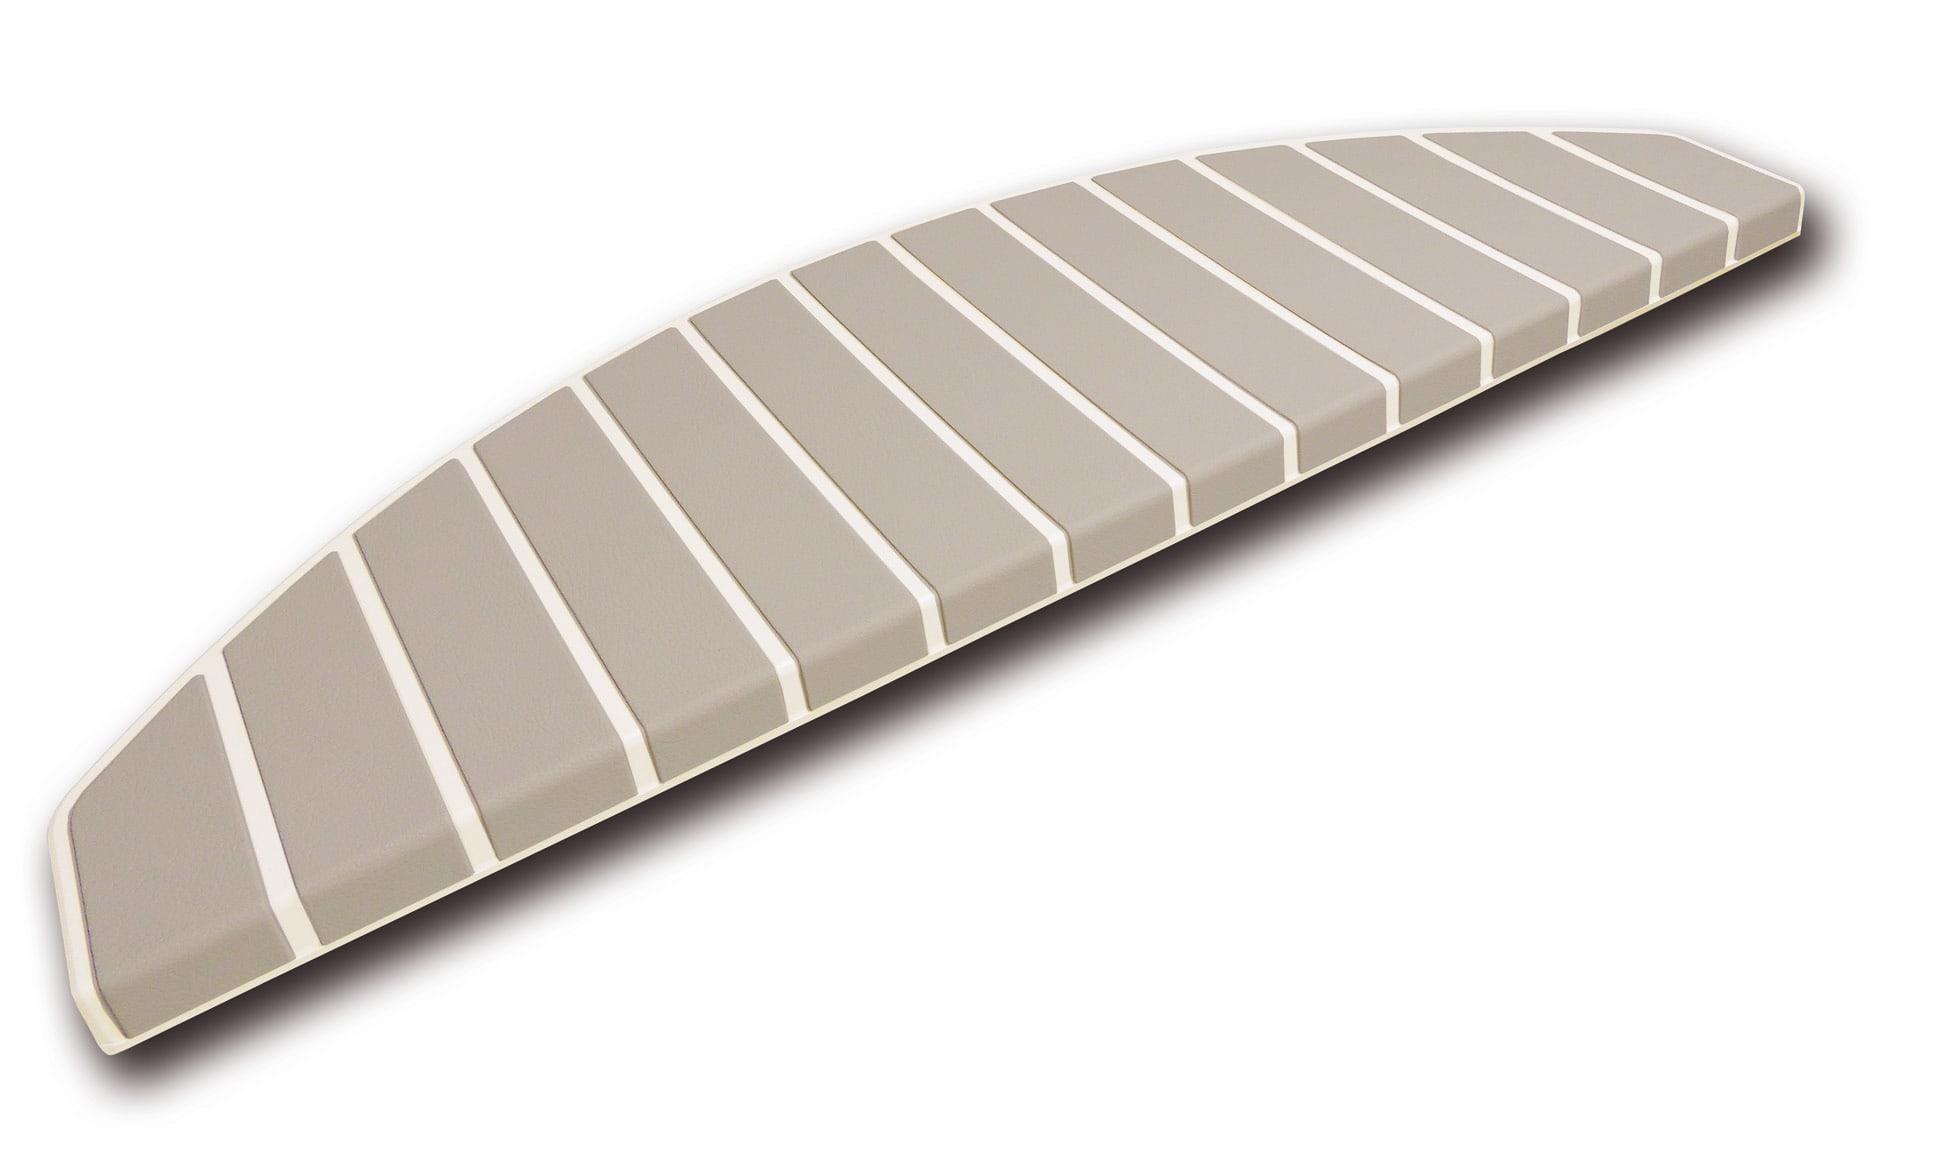 Trapmatten en trapmaantjes wit 9010 koel taupe